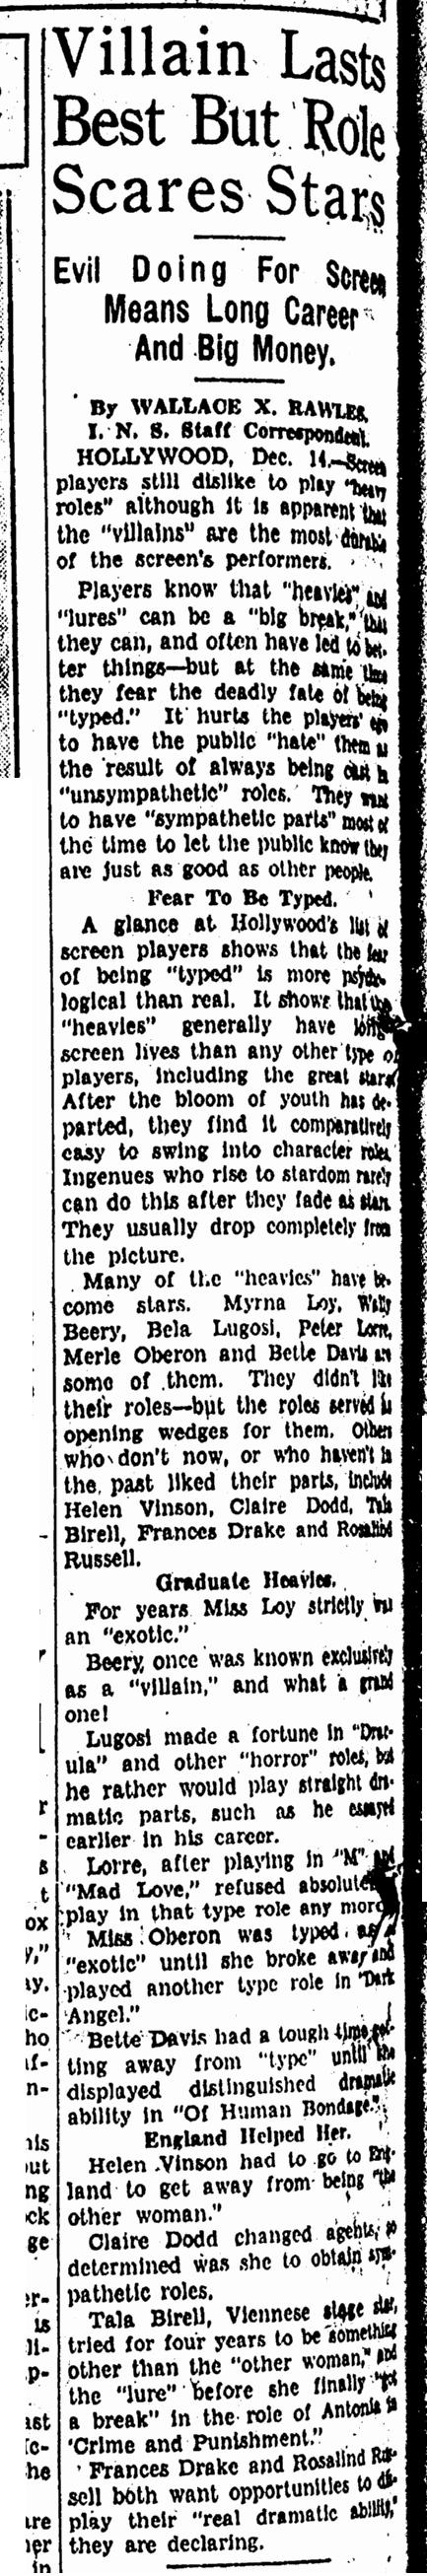 Bela Lugosi, Canton Repository, December 15, 1935